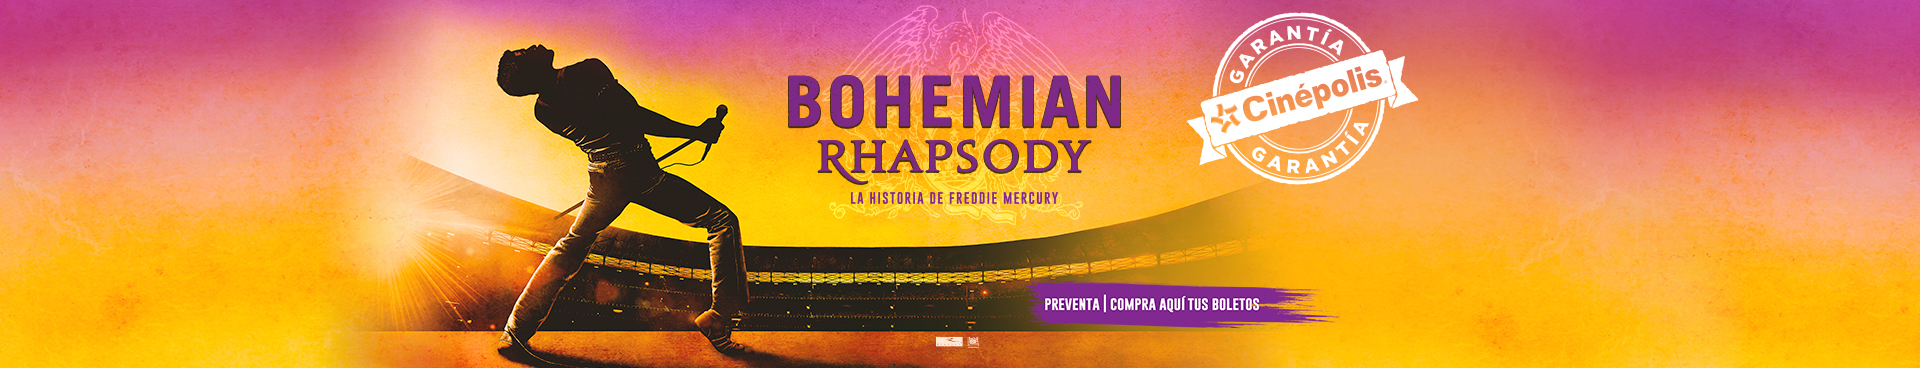 Preventa: Bohemian Rhapsody